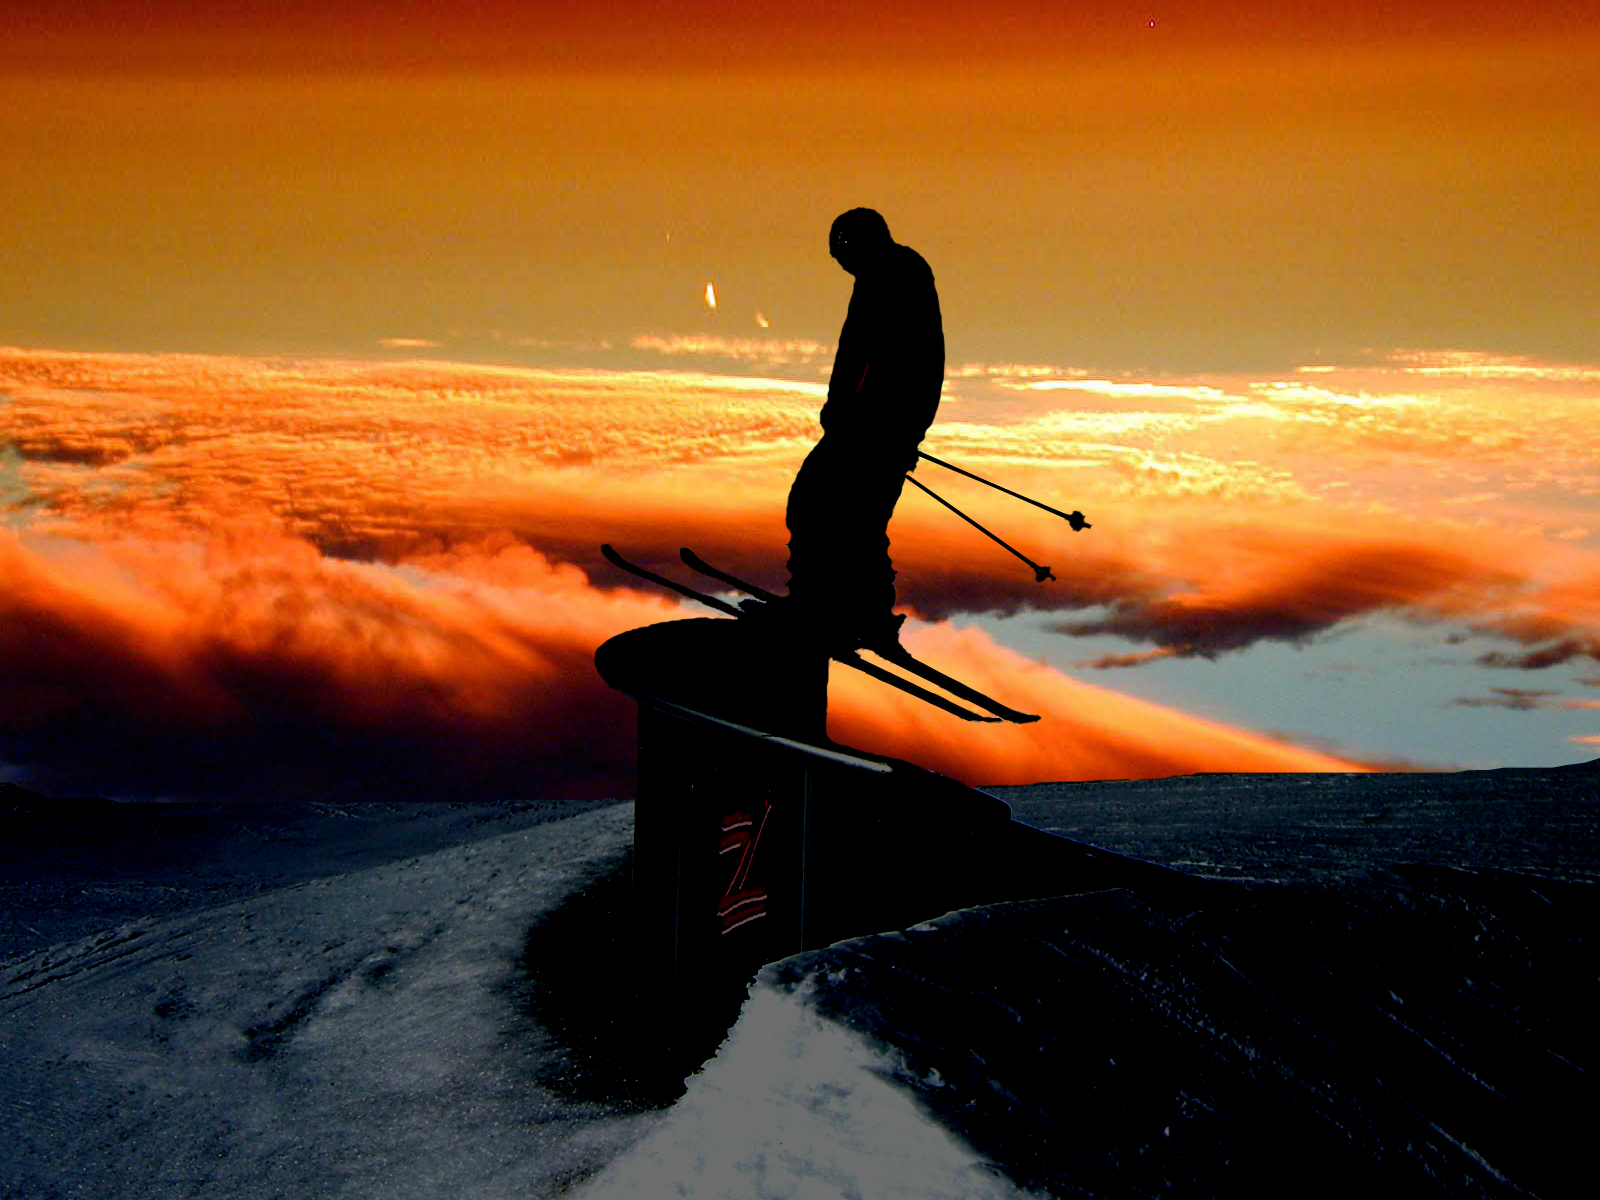 freestyle skiing wallpaper - photo #47